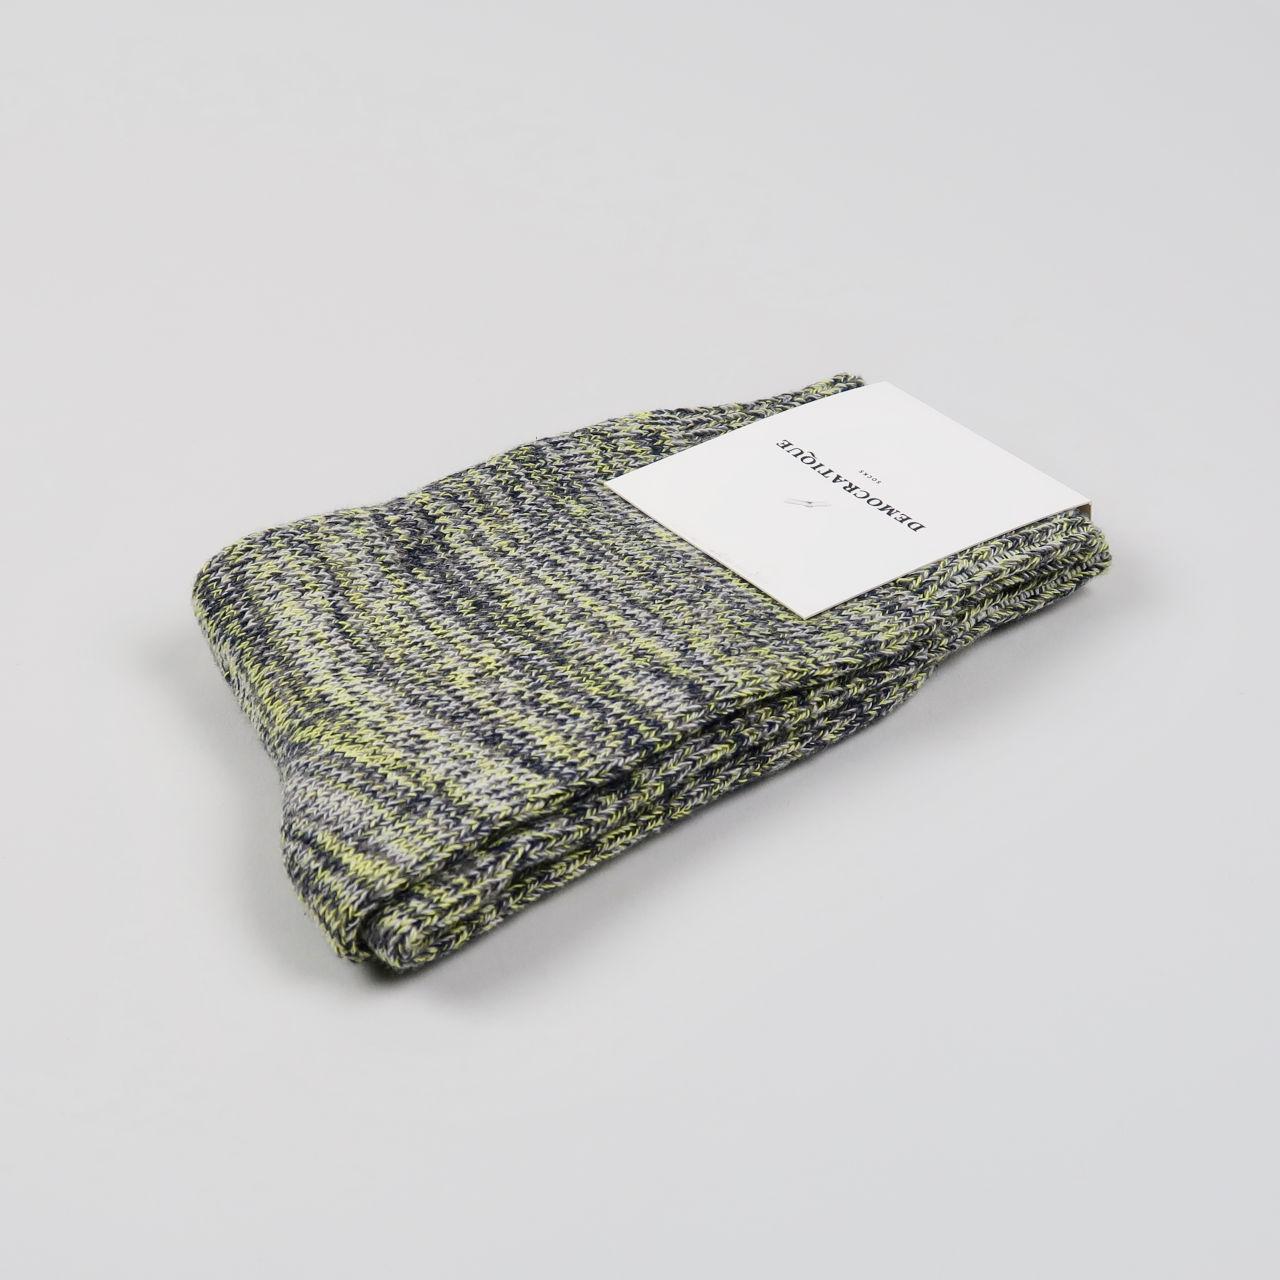 Women's Socks - Relax Chunky Knit - Warm Grey/Soft Grey/Bright Yellow/Navy